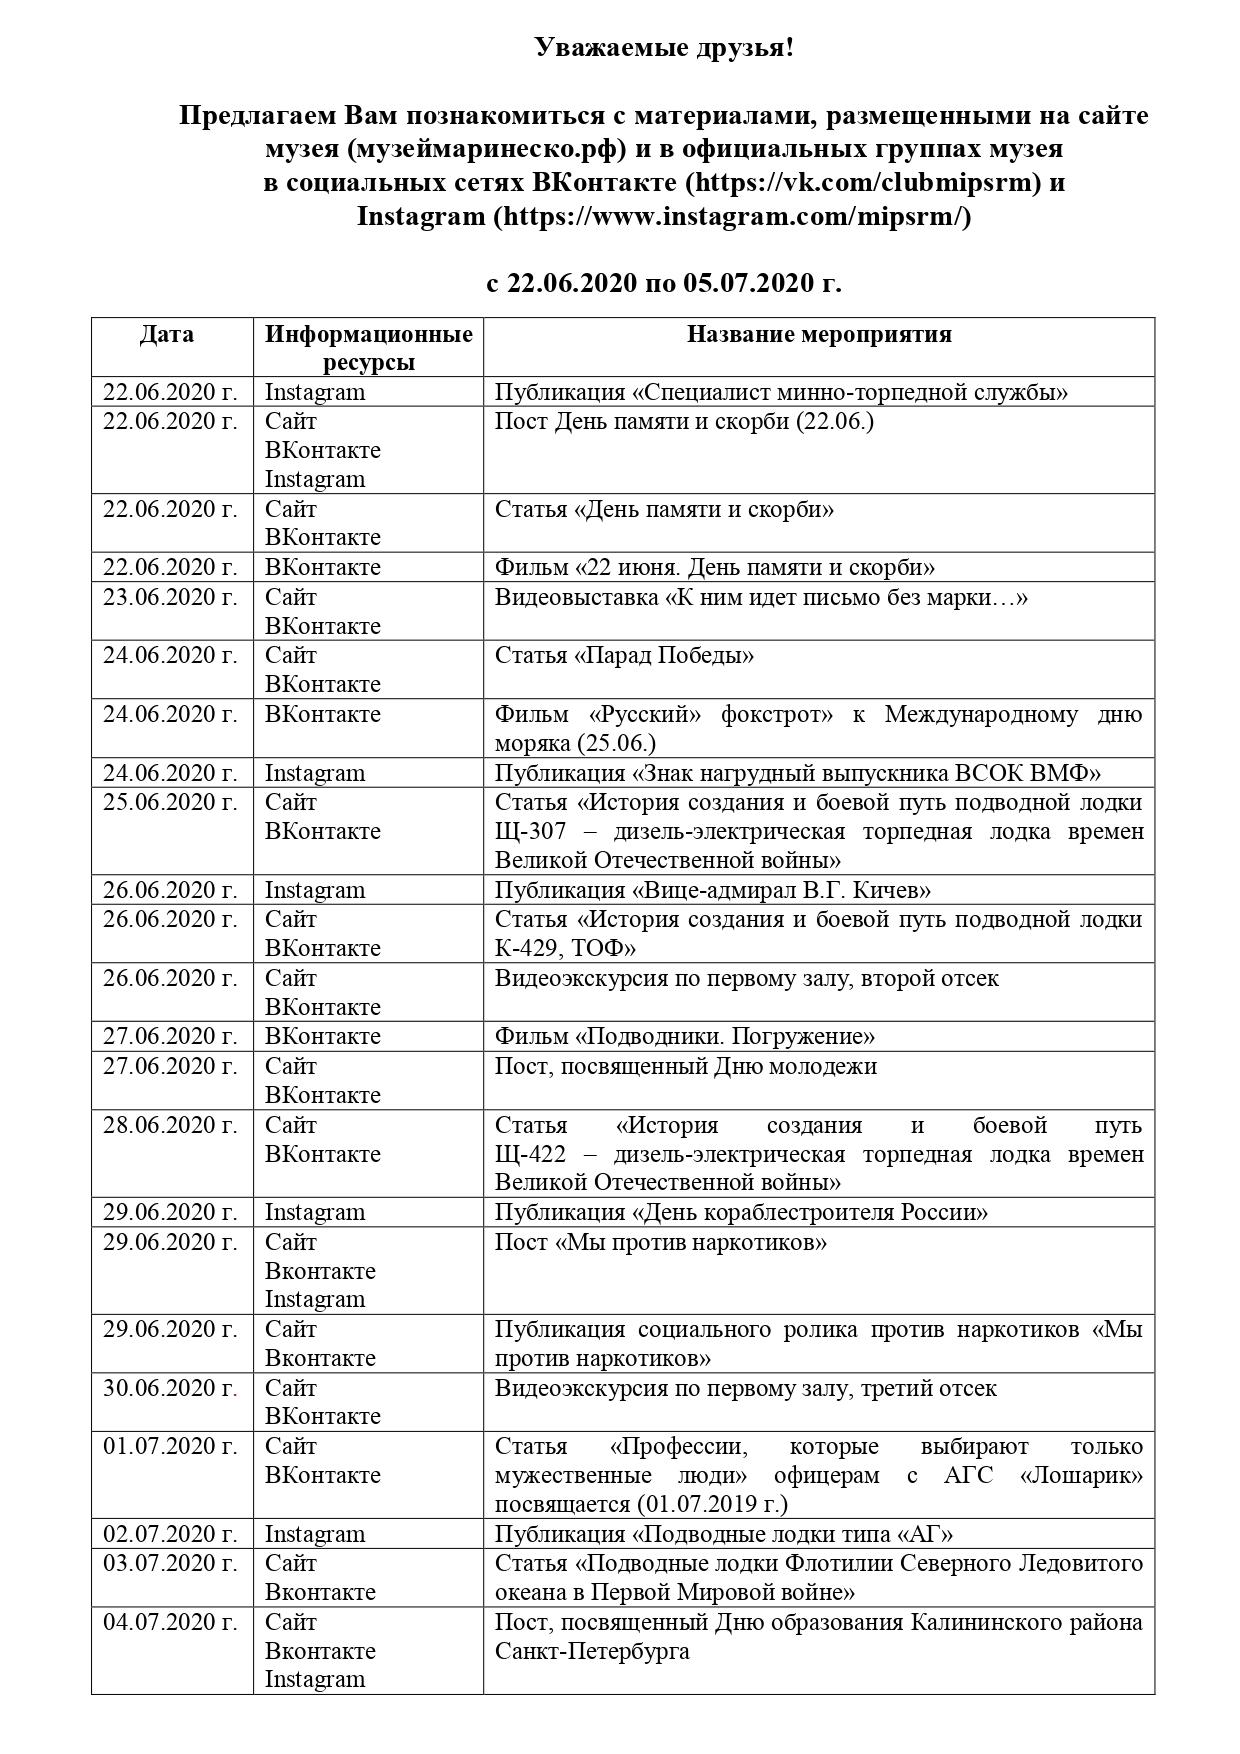 Афиша с с 22.06.2020 по 05.07.2020 года